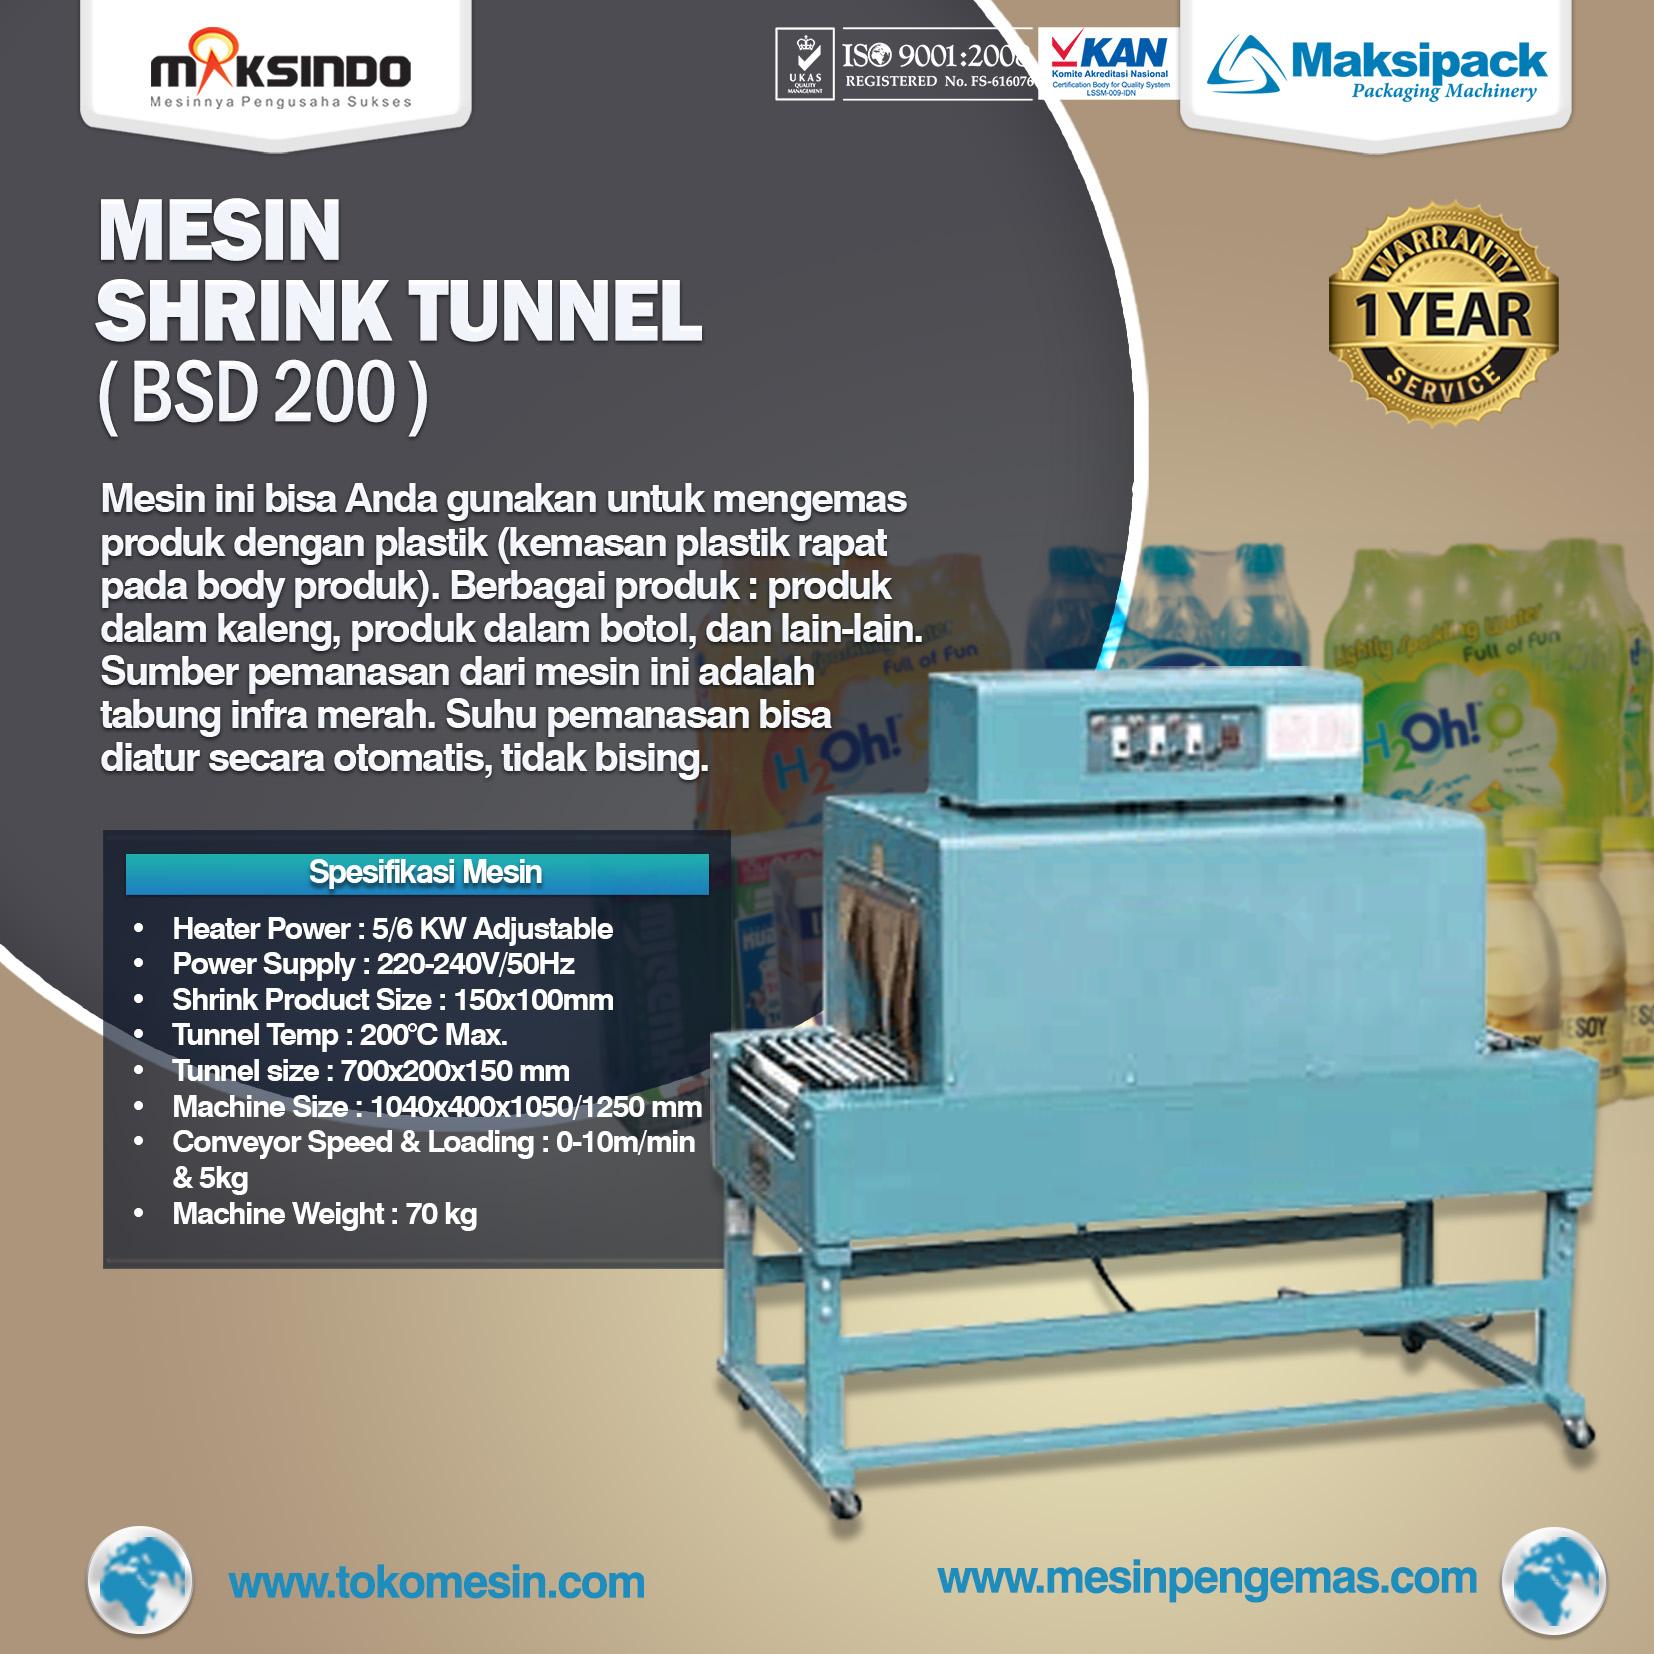 Mesin Shrink Tunnel BSD 200